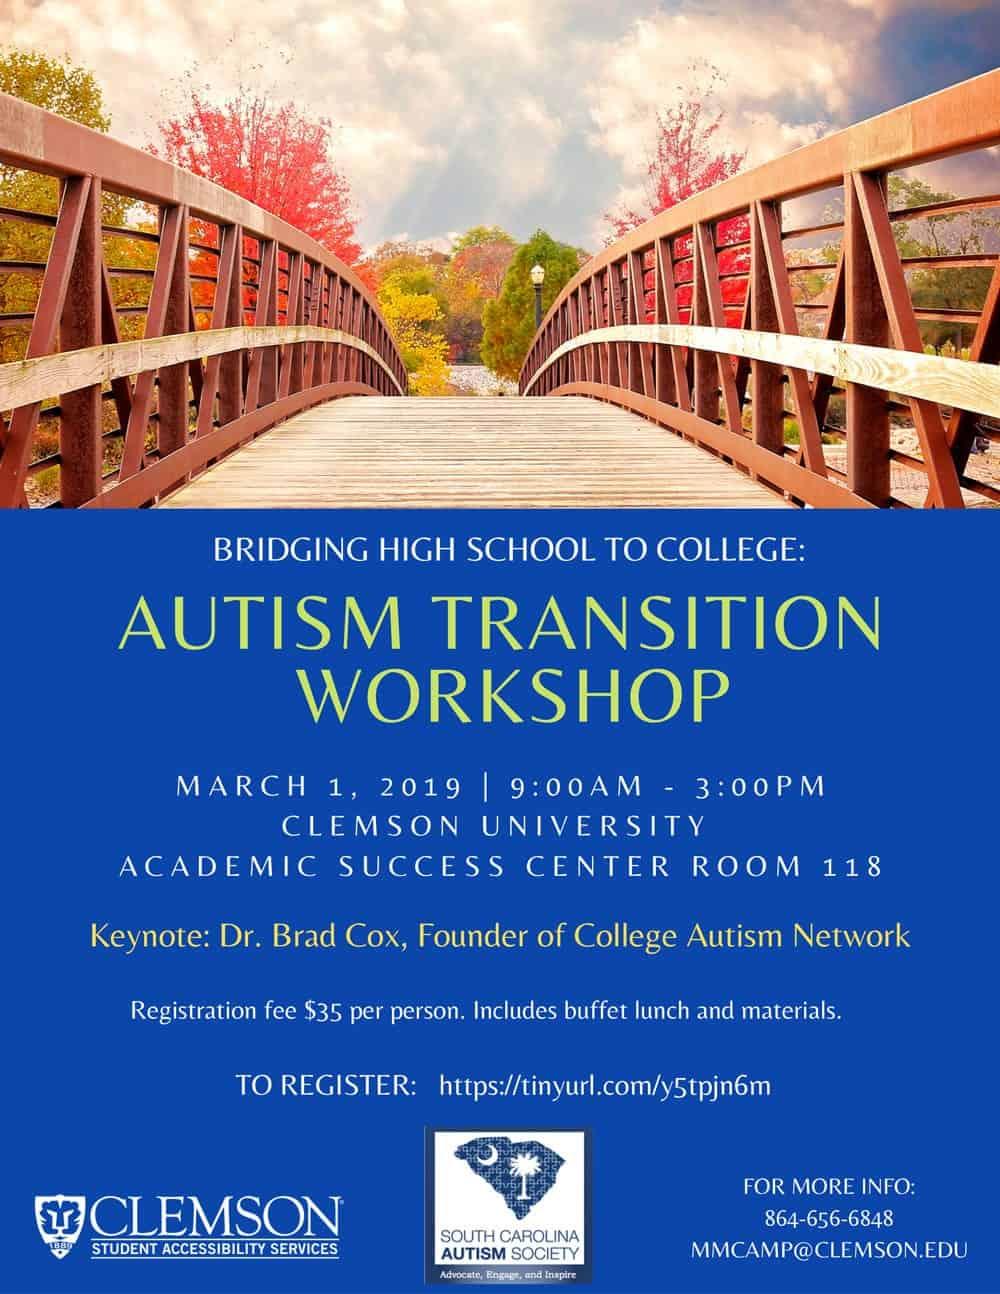 autism transition workshop with clemson